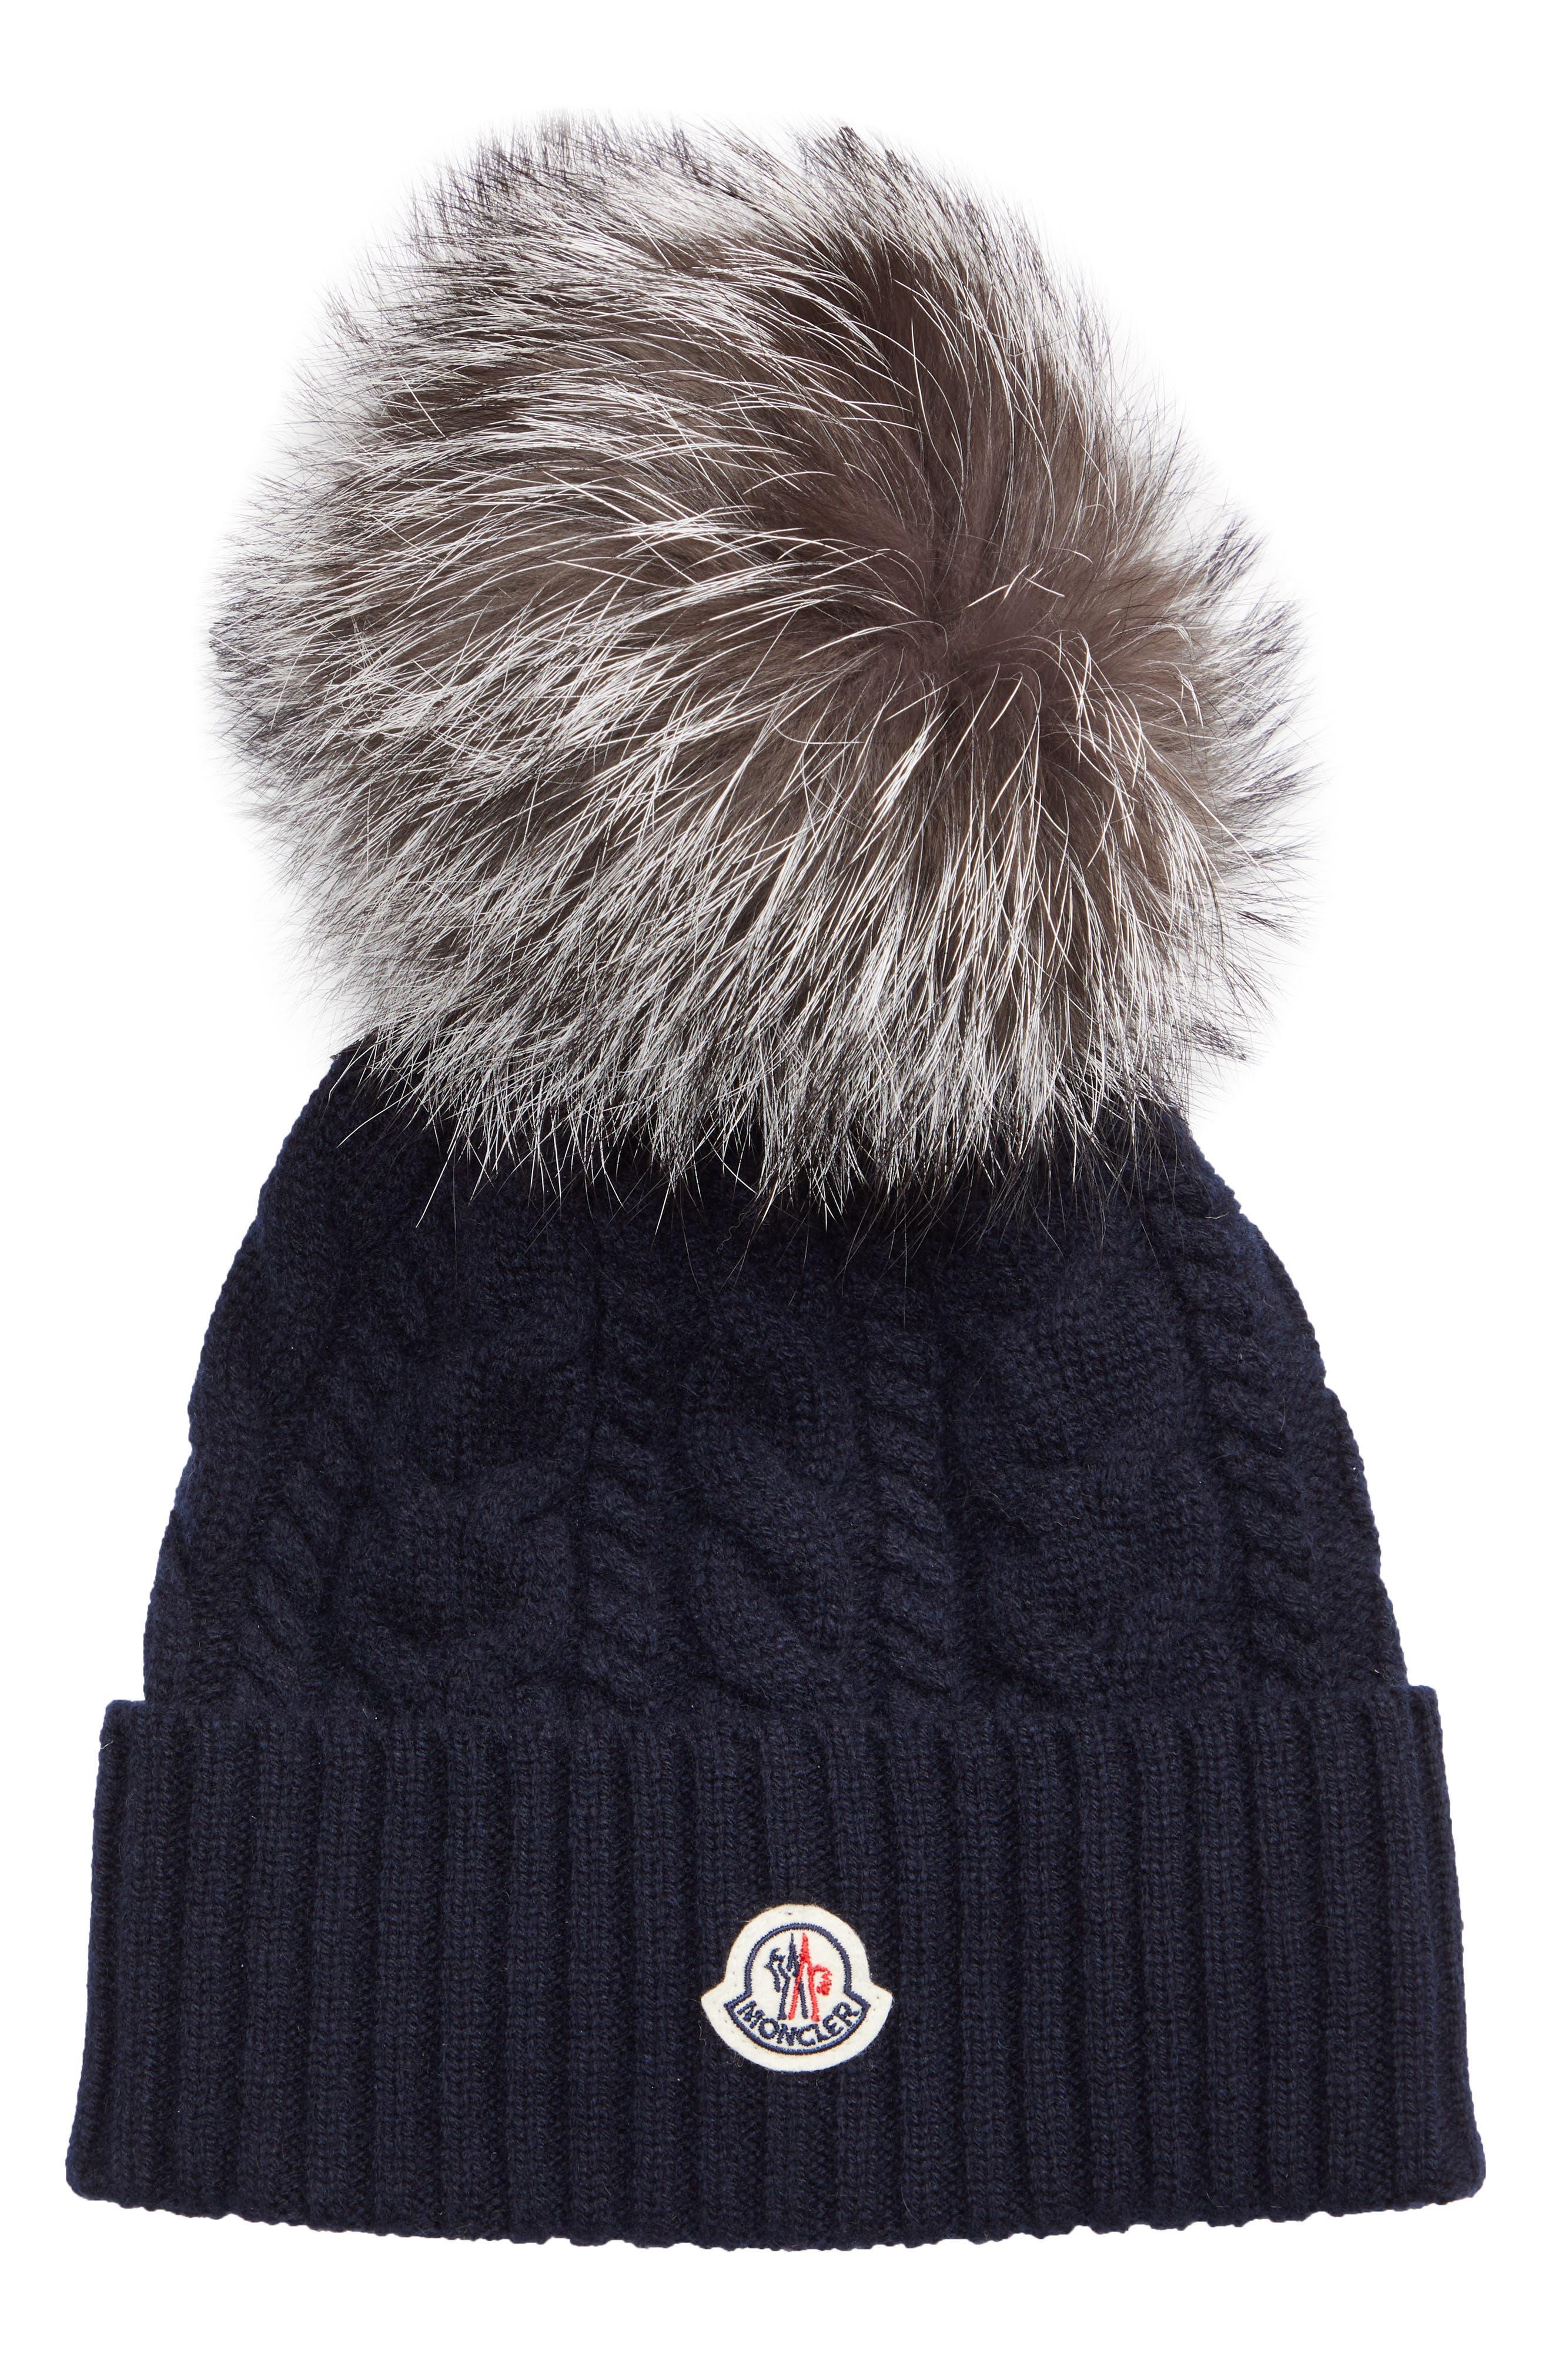 MONCLER Genuine Fox Fur Pom Wool Beanie, Main, color, NAVY